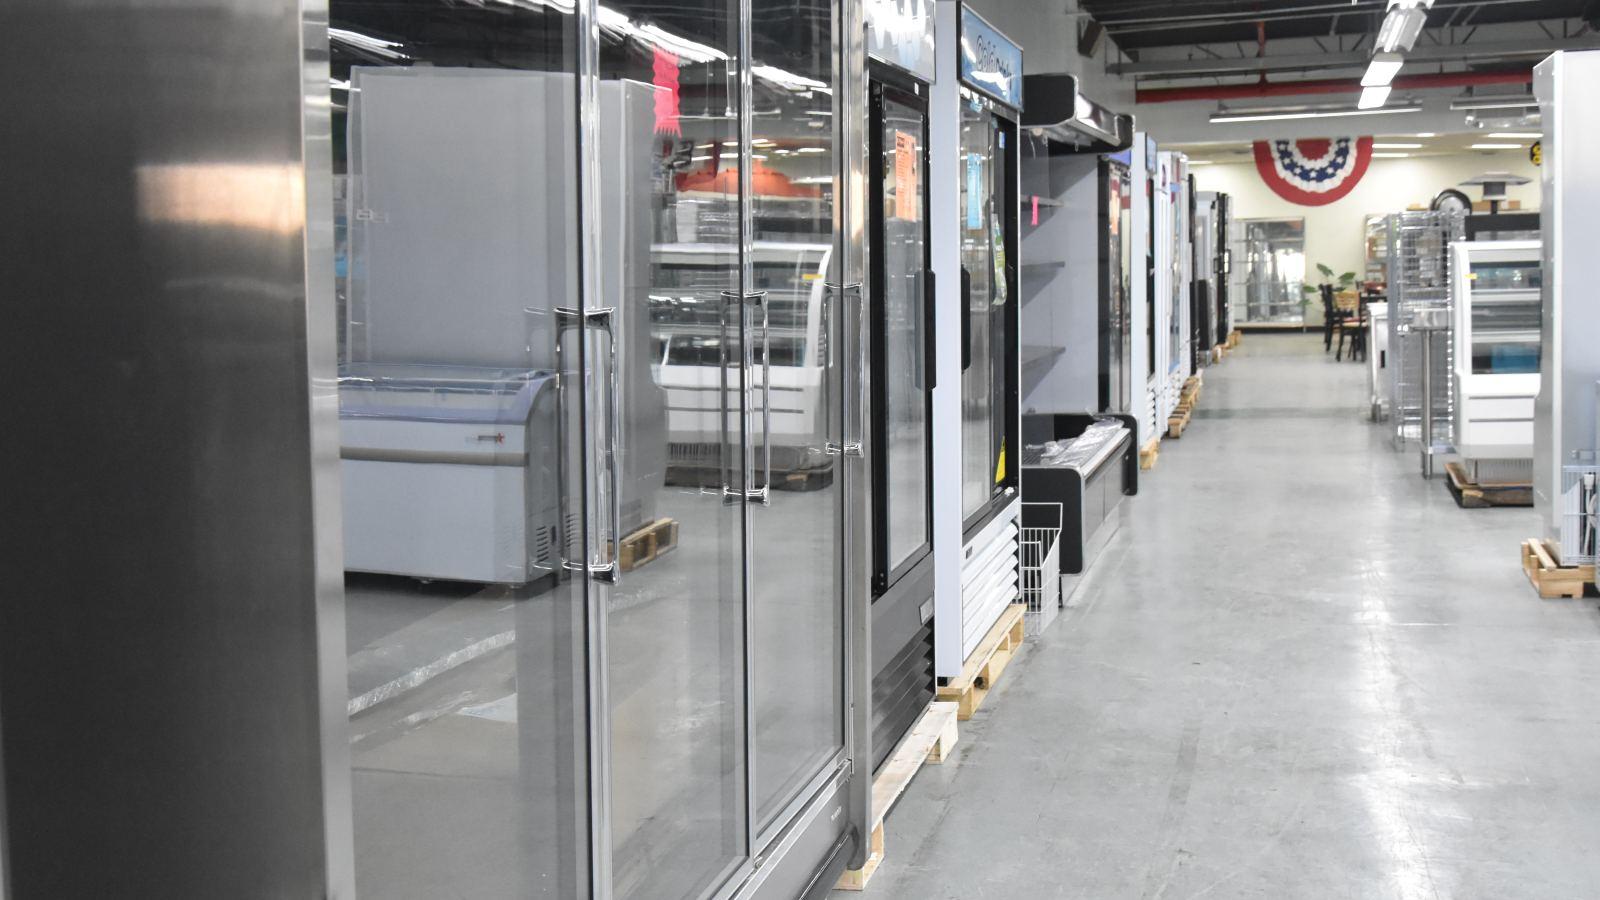 Shop commercial refrigeration equipment..